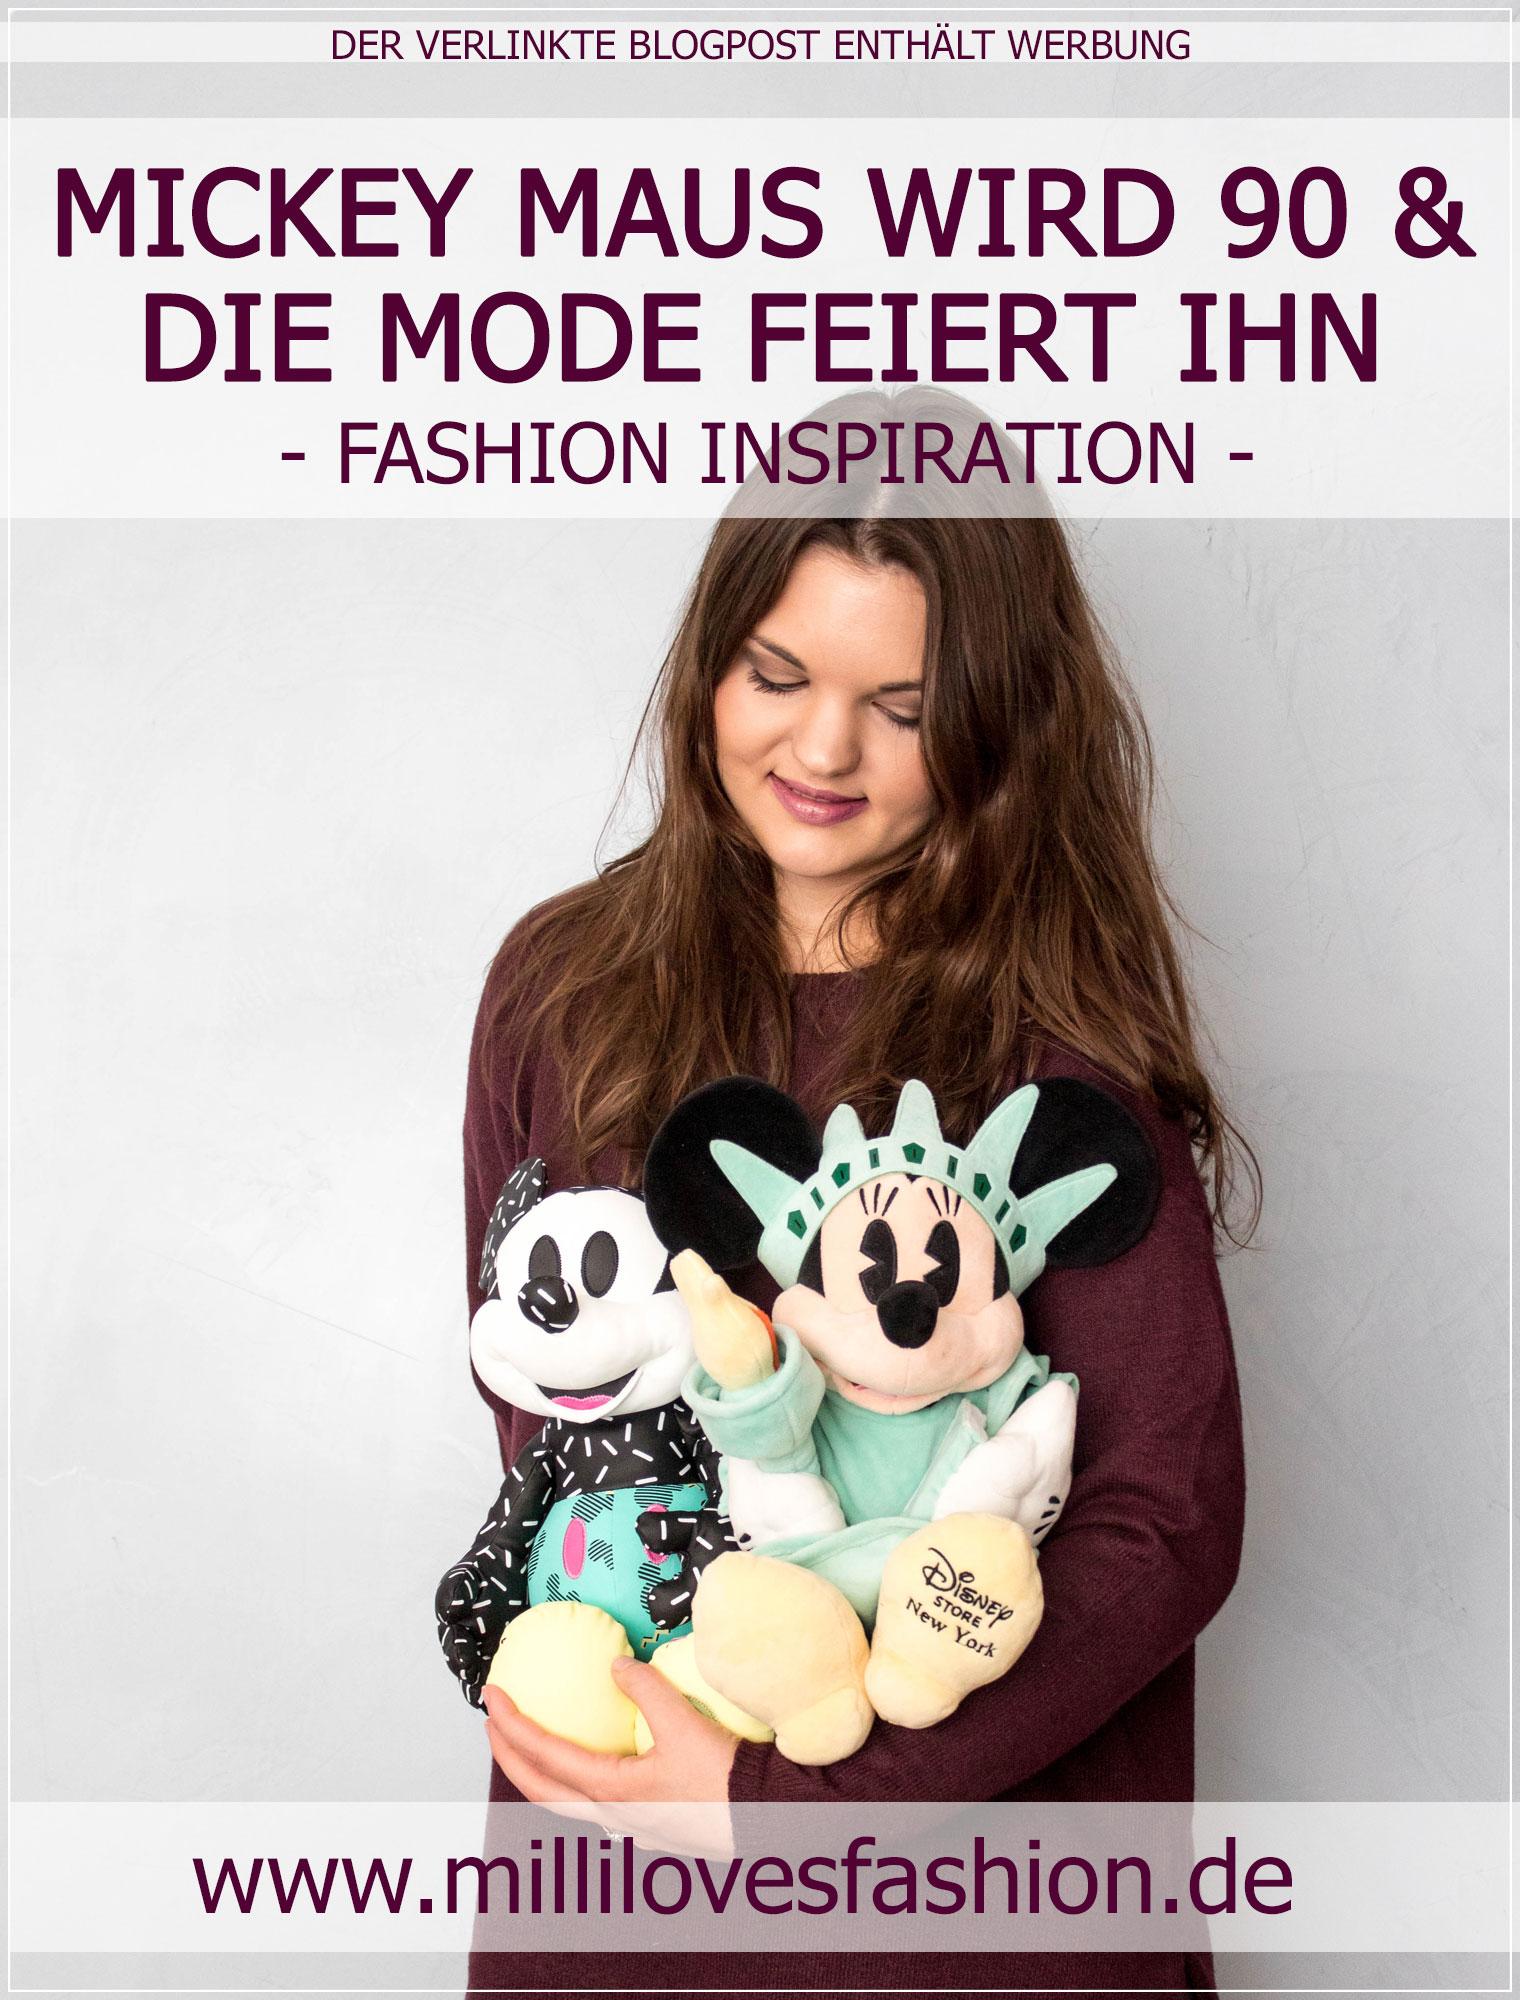 Mickey Maus, Disney, Mickey wird 90, Minnie Maus, Disney Blogger, Modetrends, Blogger, Fashionblogger, Ruhrgebiet